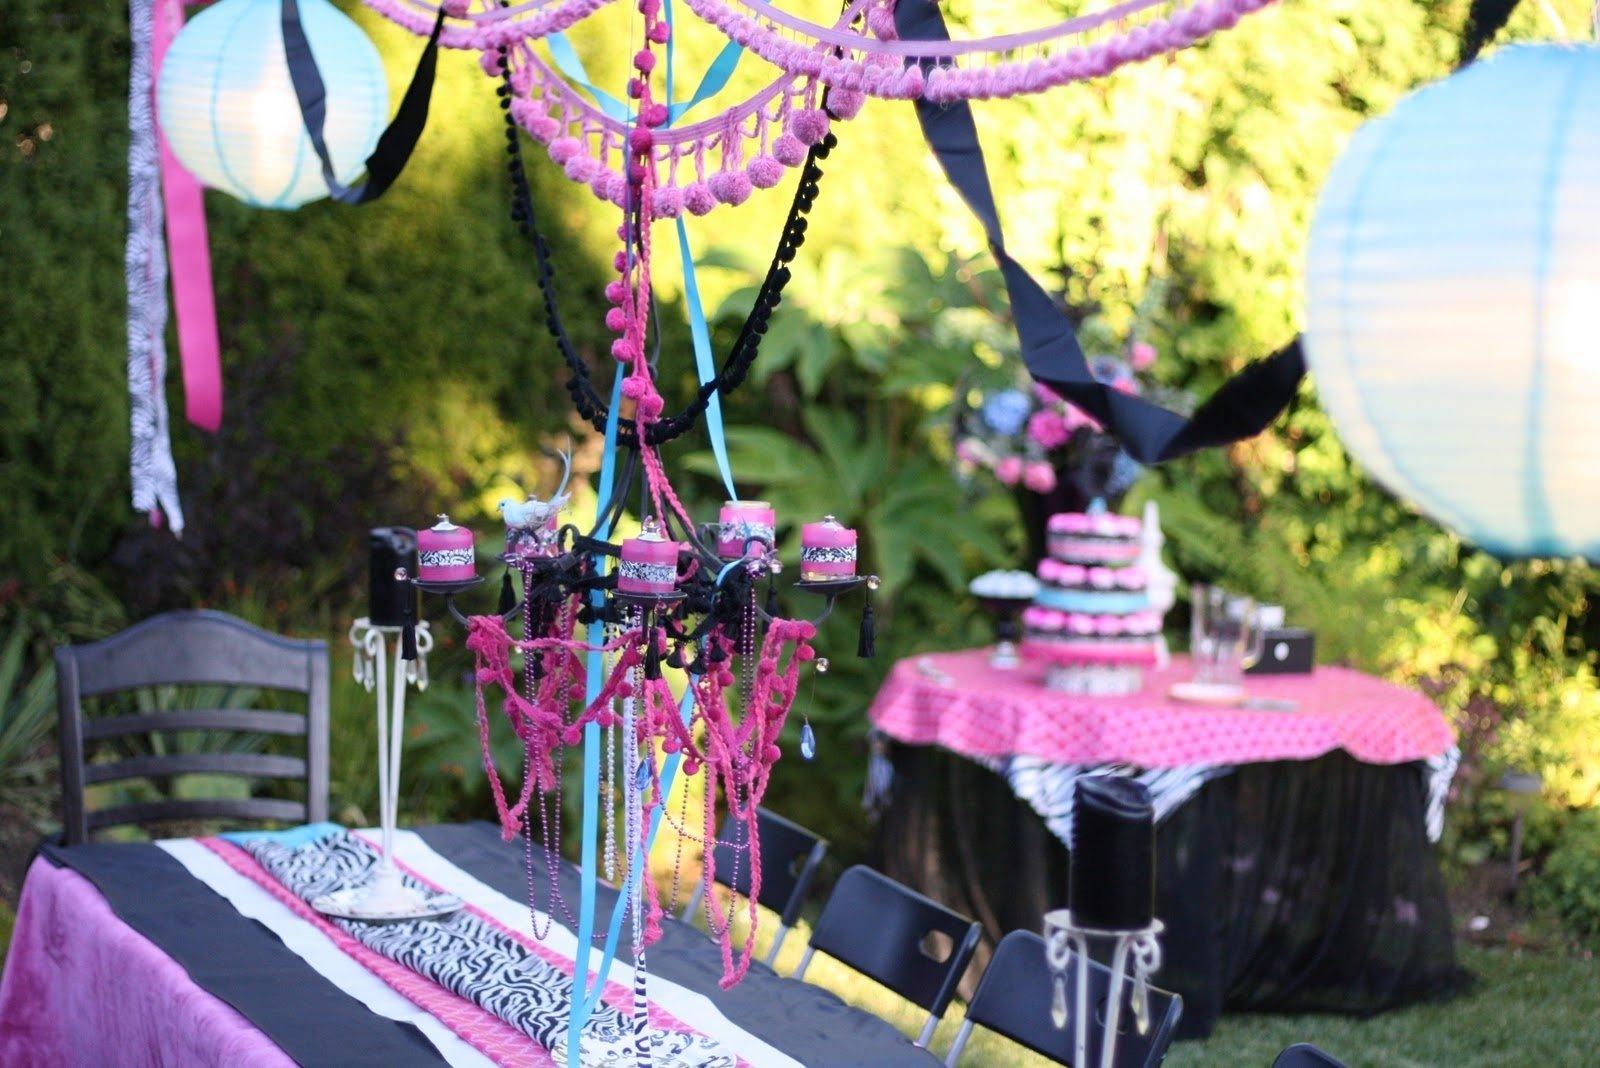 10 Most Popular Birthday Party Ideas Richmond Va birthday party ideas birthday party ideas teenage girl 5 2021